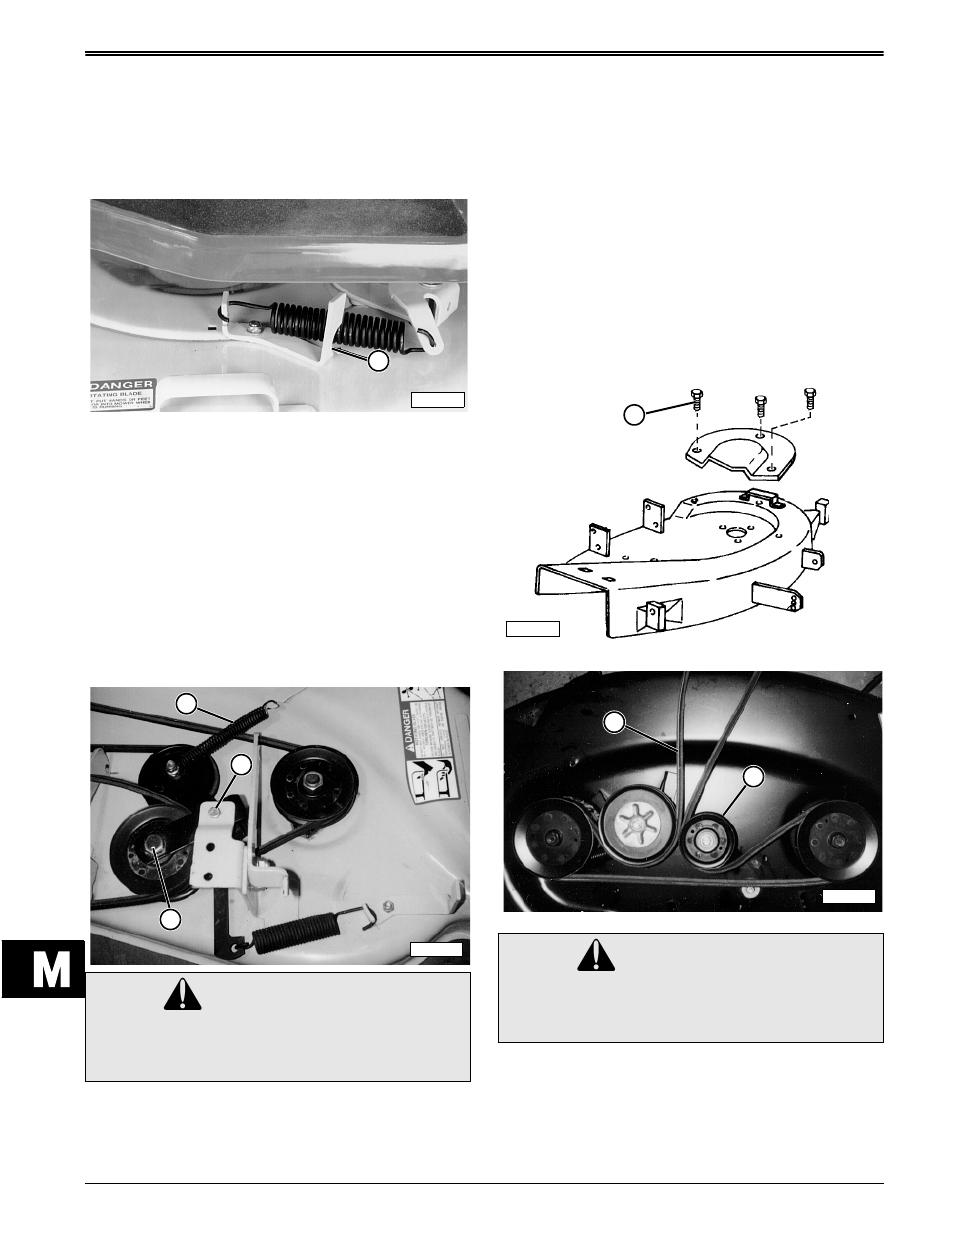 John Deere Stx 38 Belt Diagram